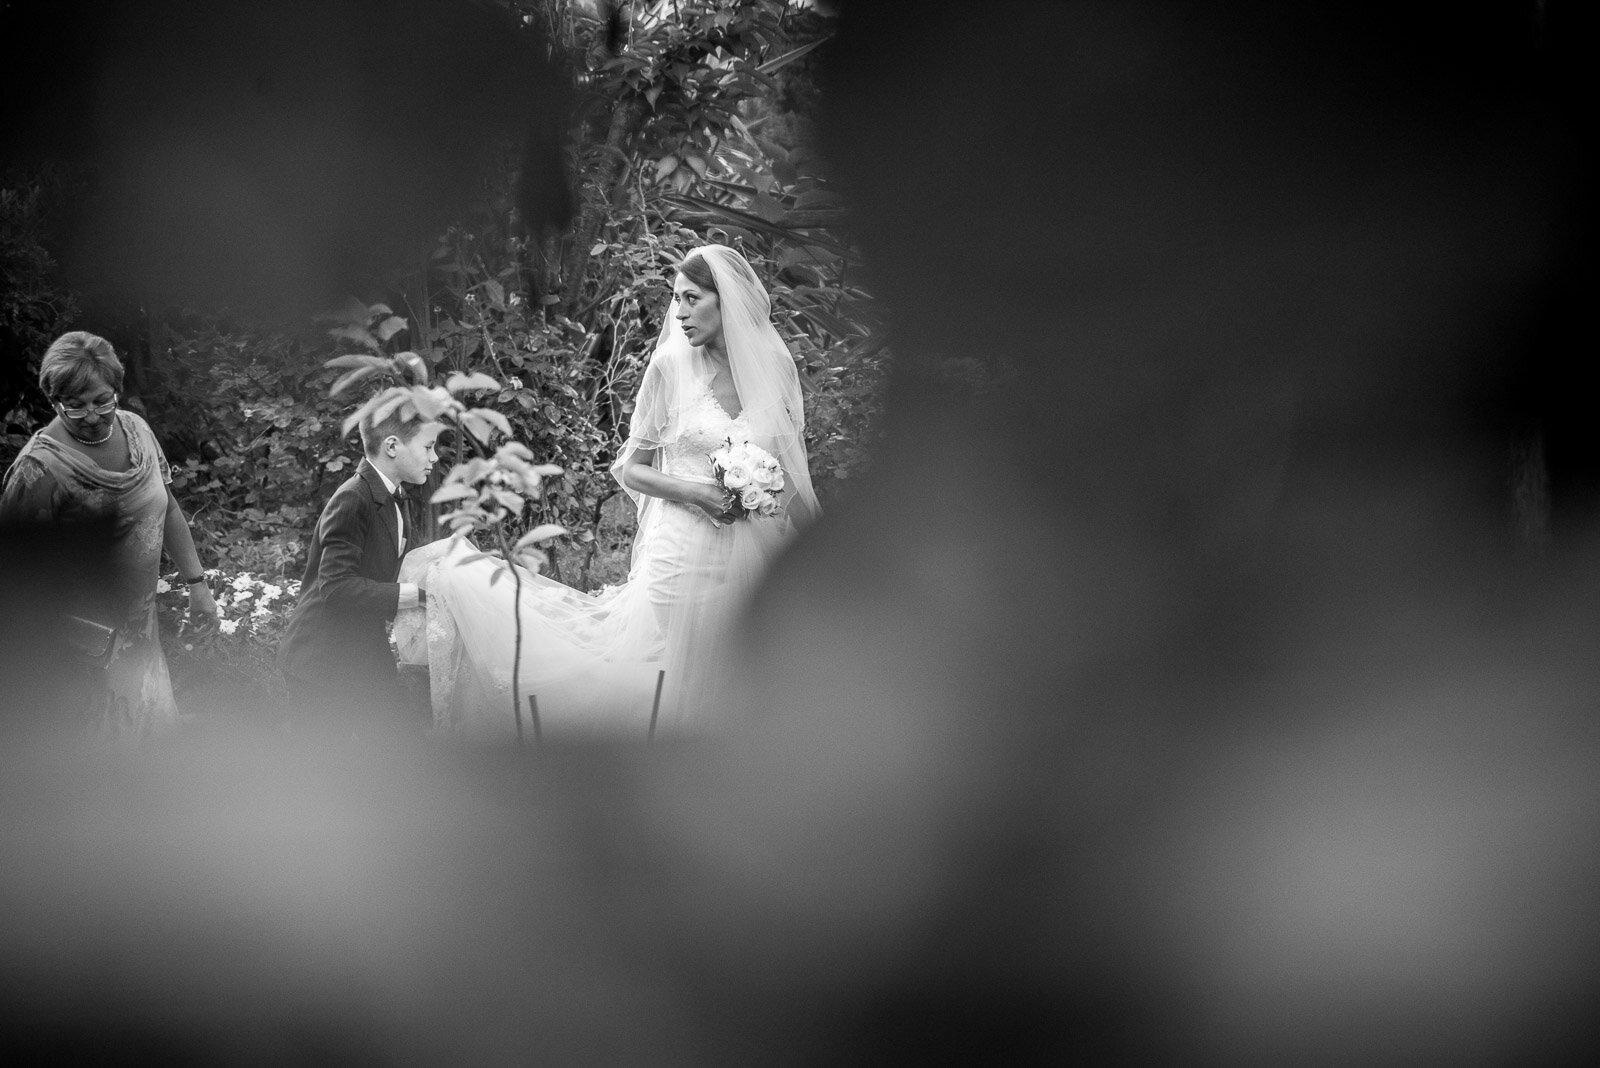 Russian Wedding in Villa Cimbrone Costiera Amalfitana 10.jpg